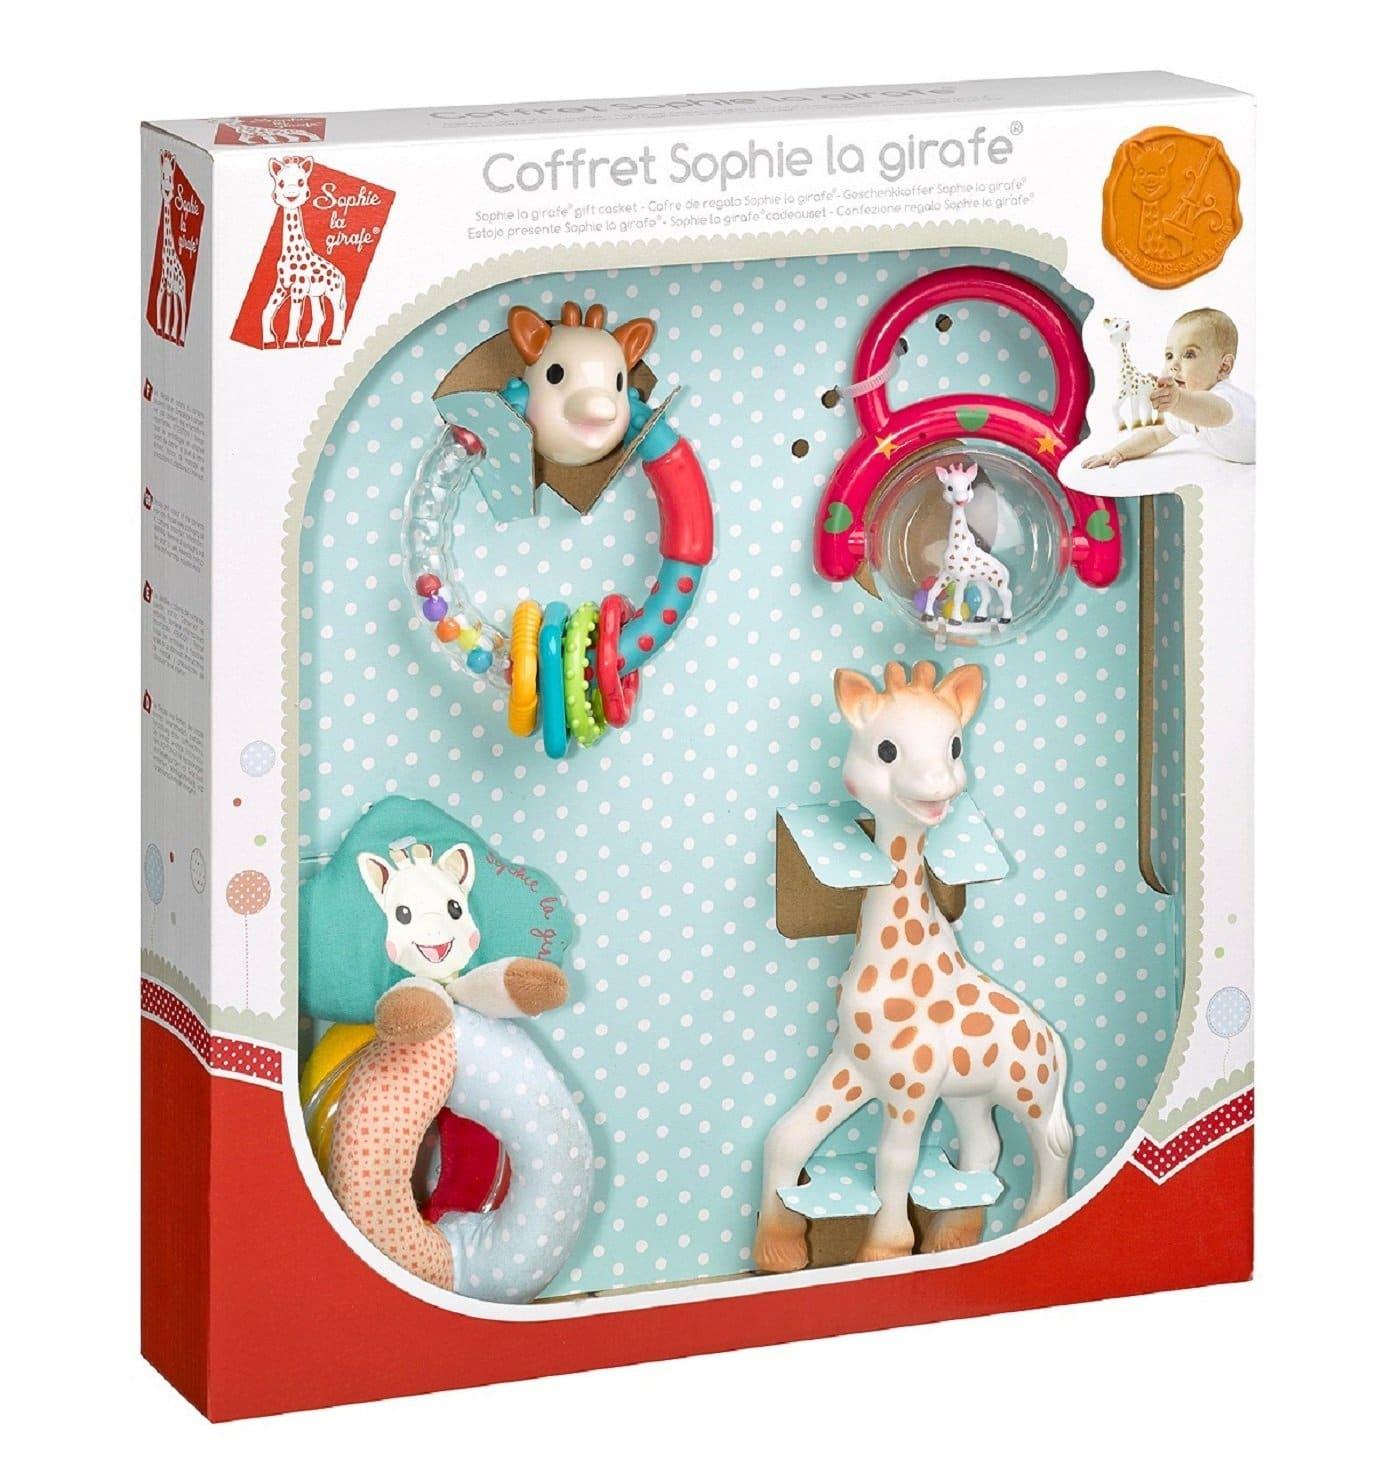 coffret sophie la girafe testeur du dimanche. Black Bedroom Furniture Sets. Home Design Ideas